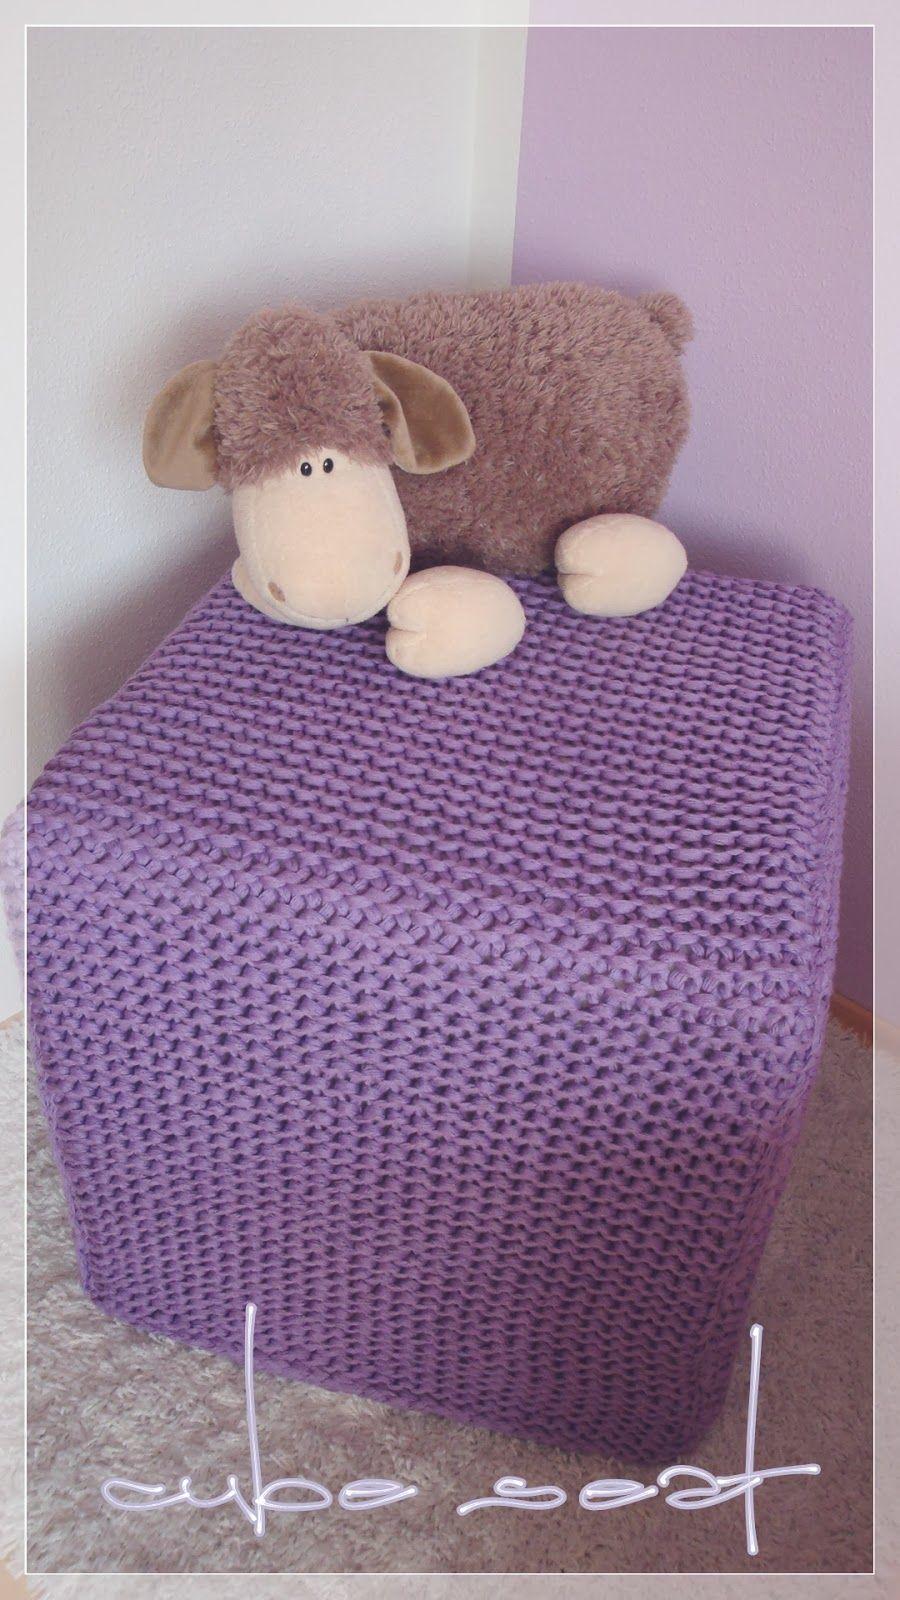 cube seat strickideen. Black Bedroom Furniture Sets. Home Design Ideas